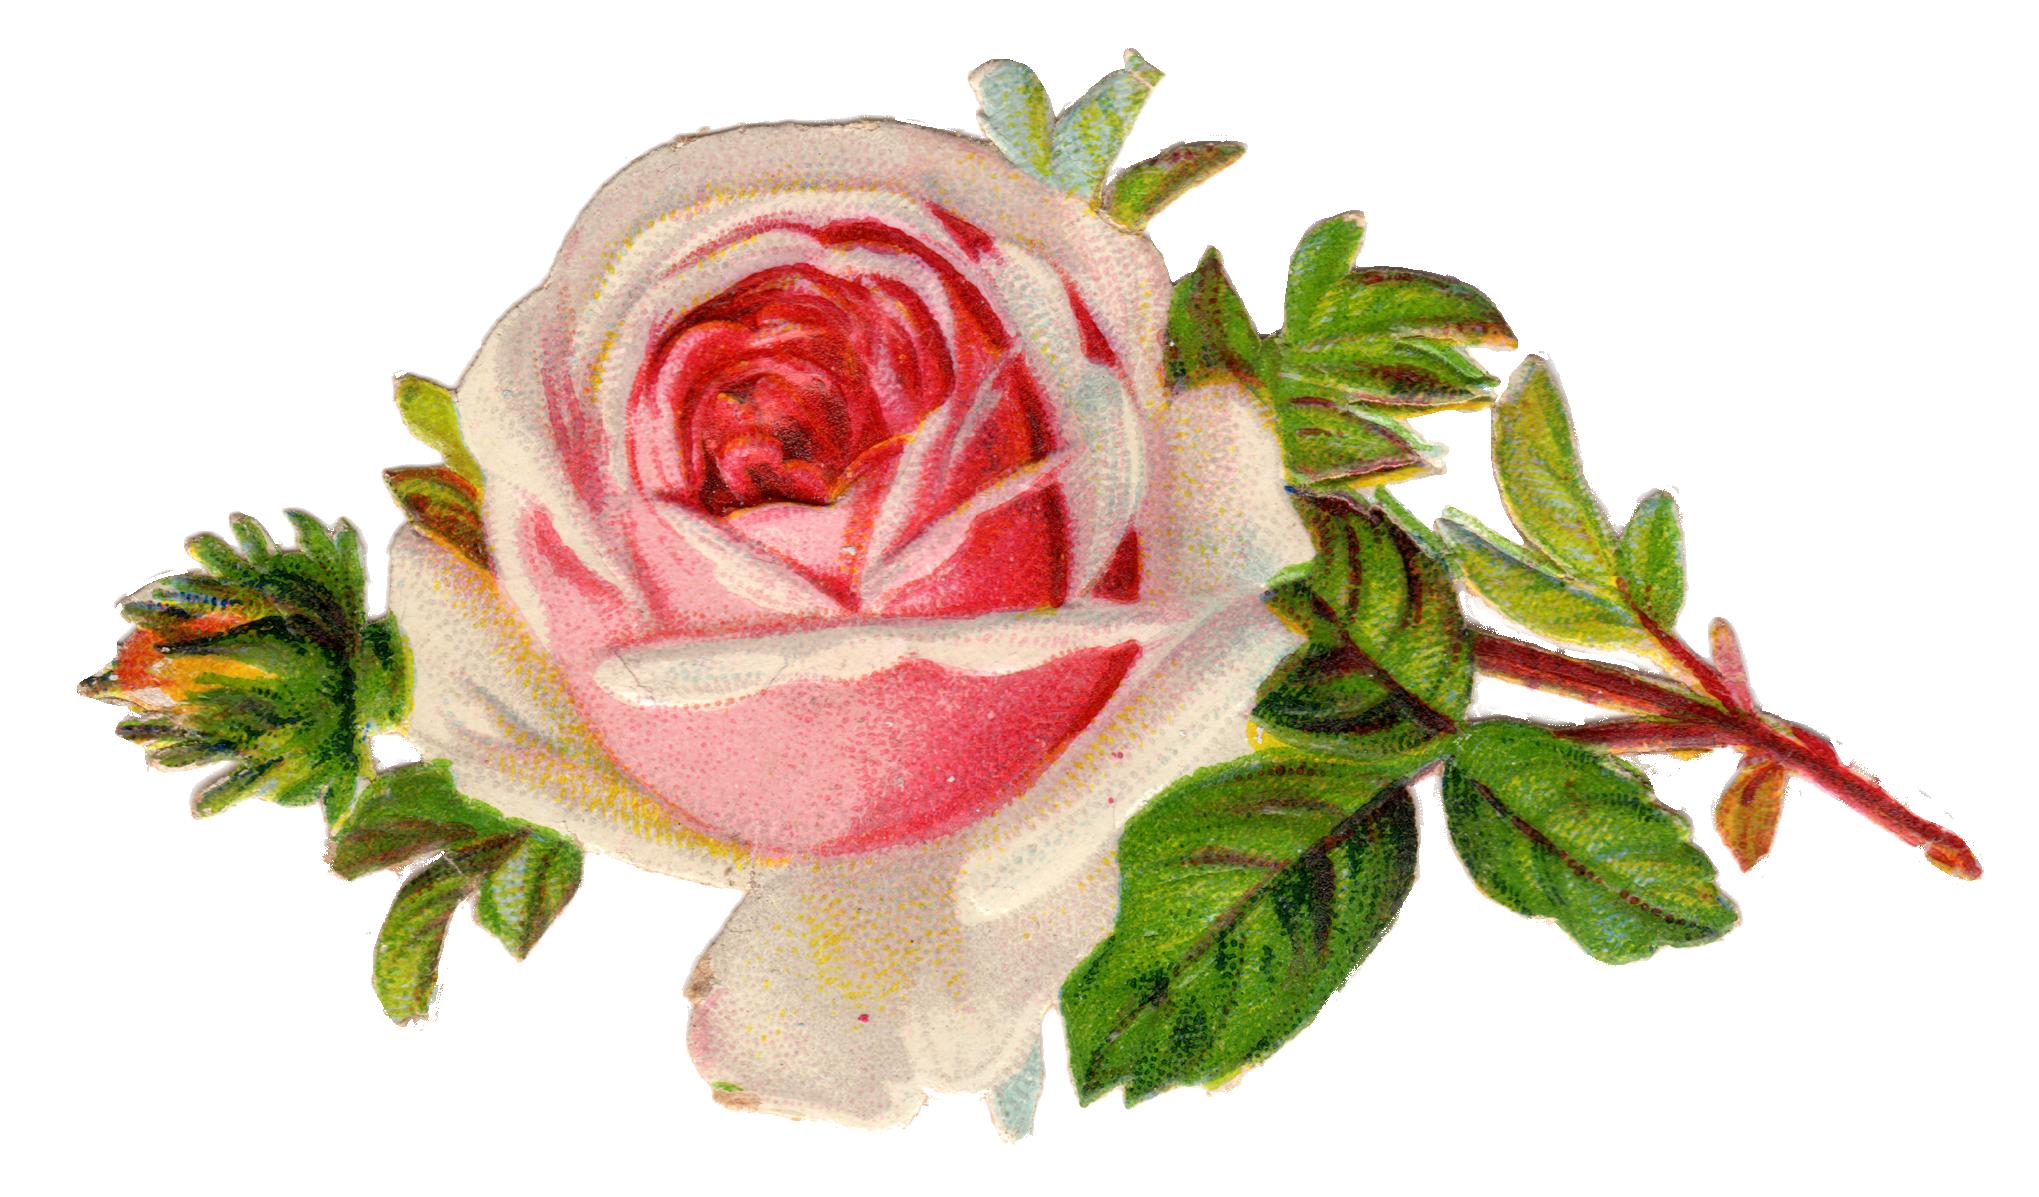 Free Vintage Rose Clip Art Free Pretty T-Free Vintage Rose Clip Art Free Pretty Things For You-11